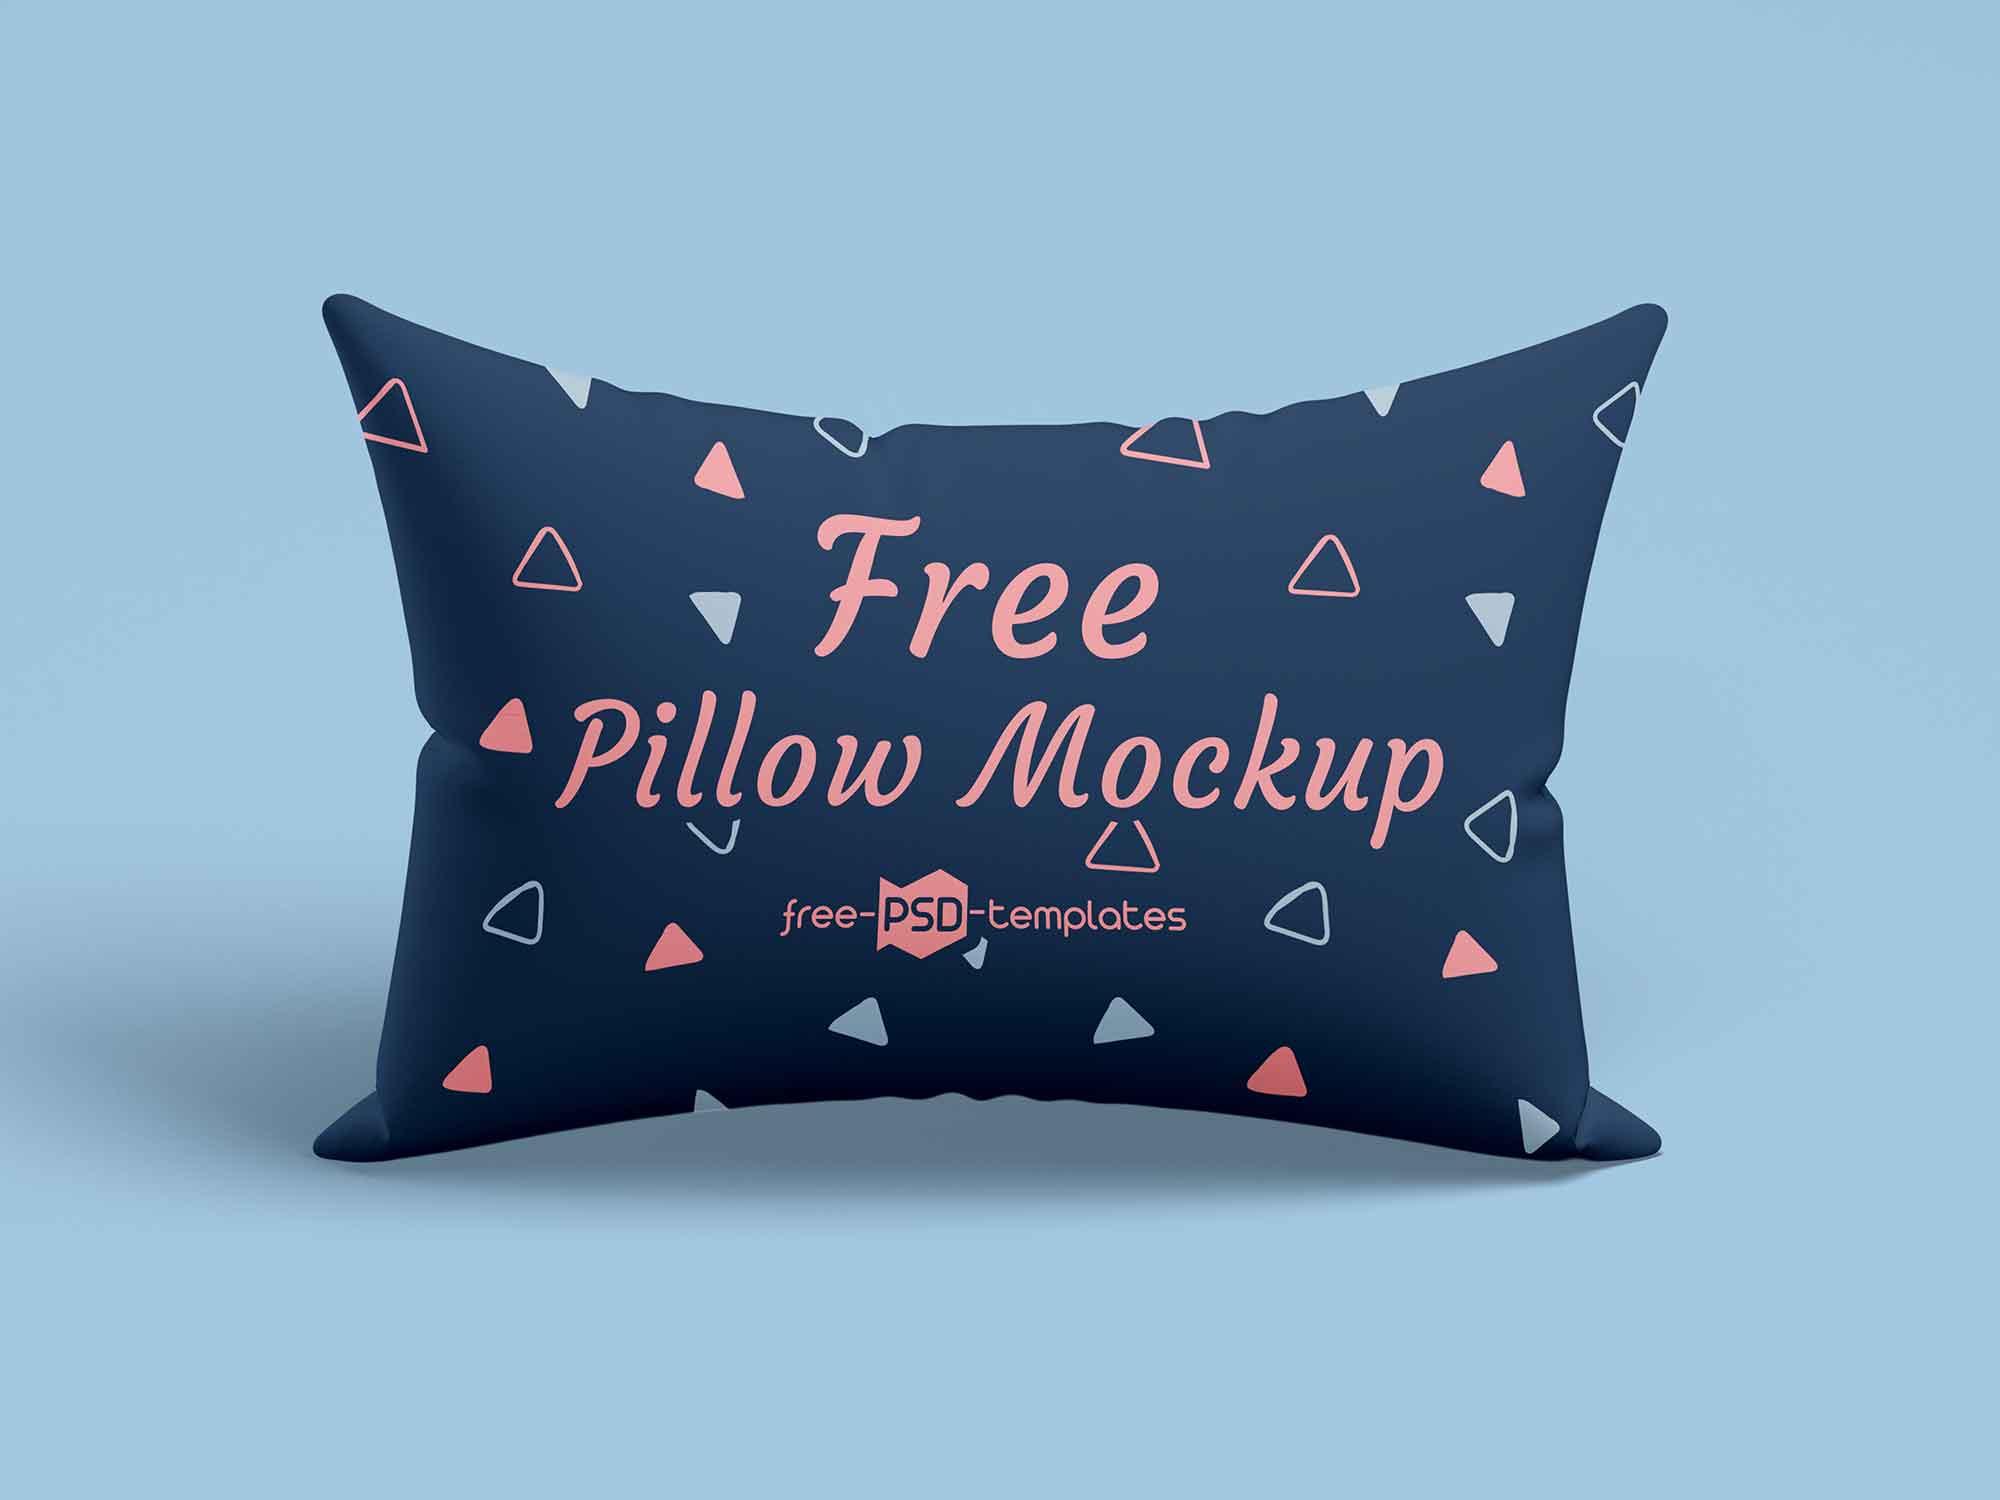 Pillows Mockup Template 2